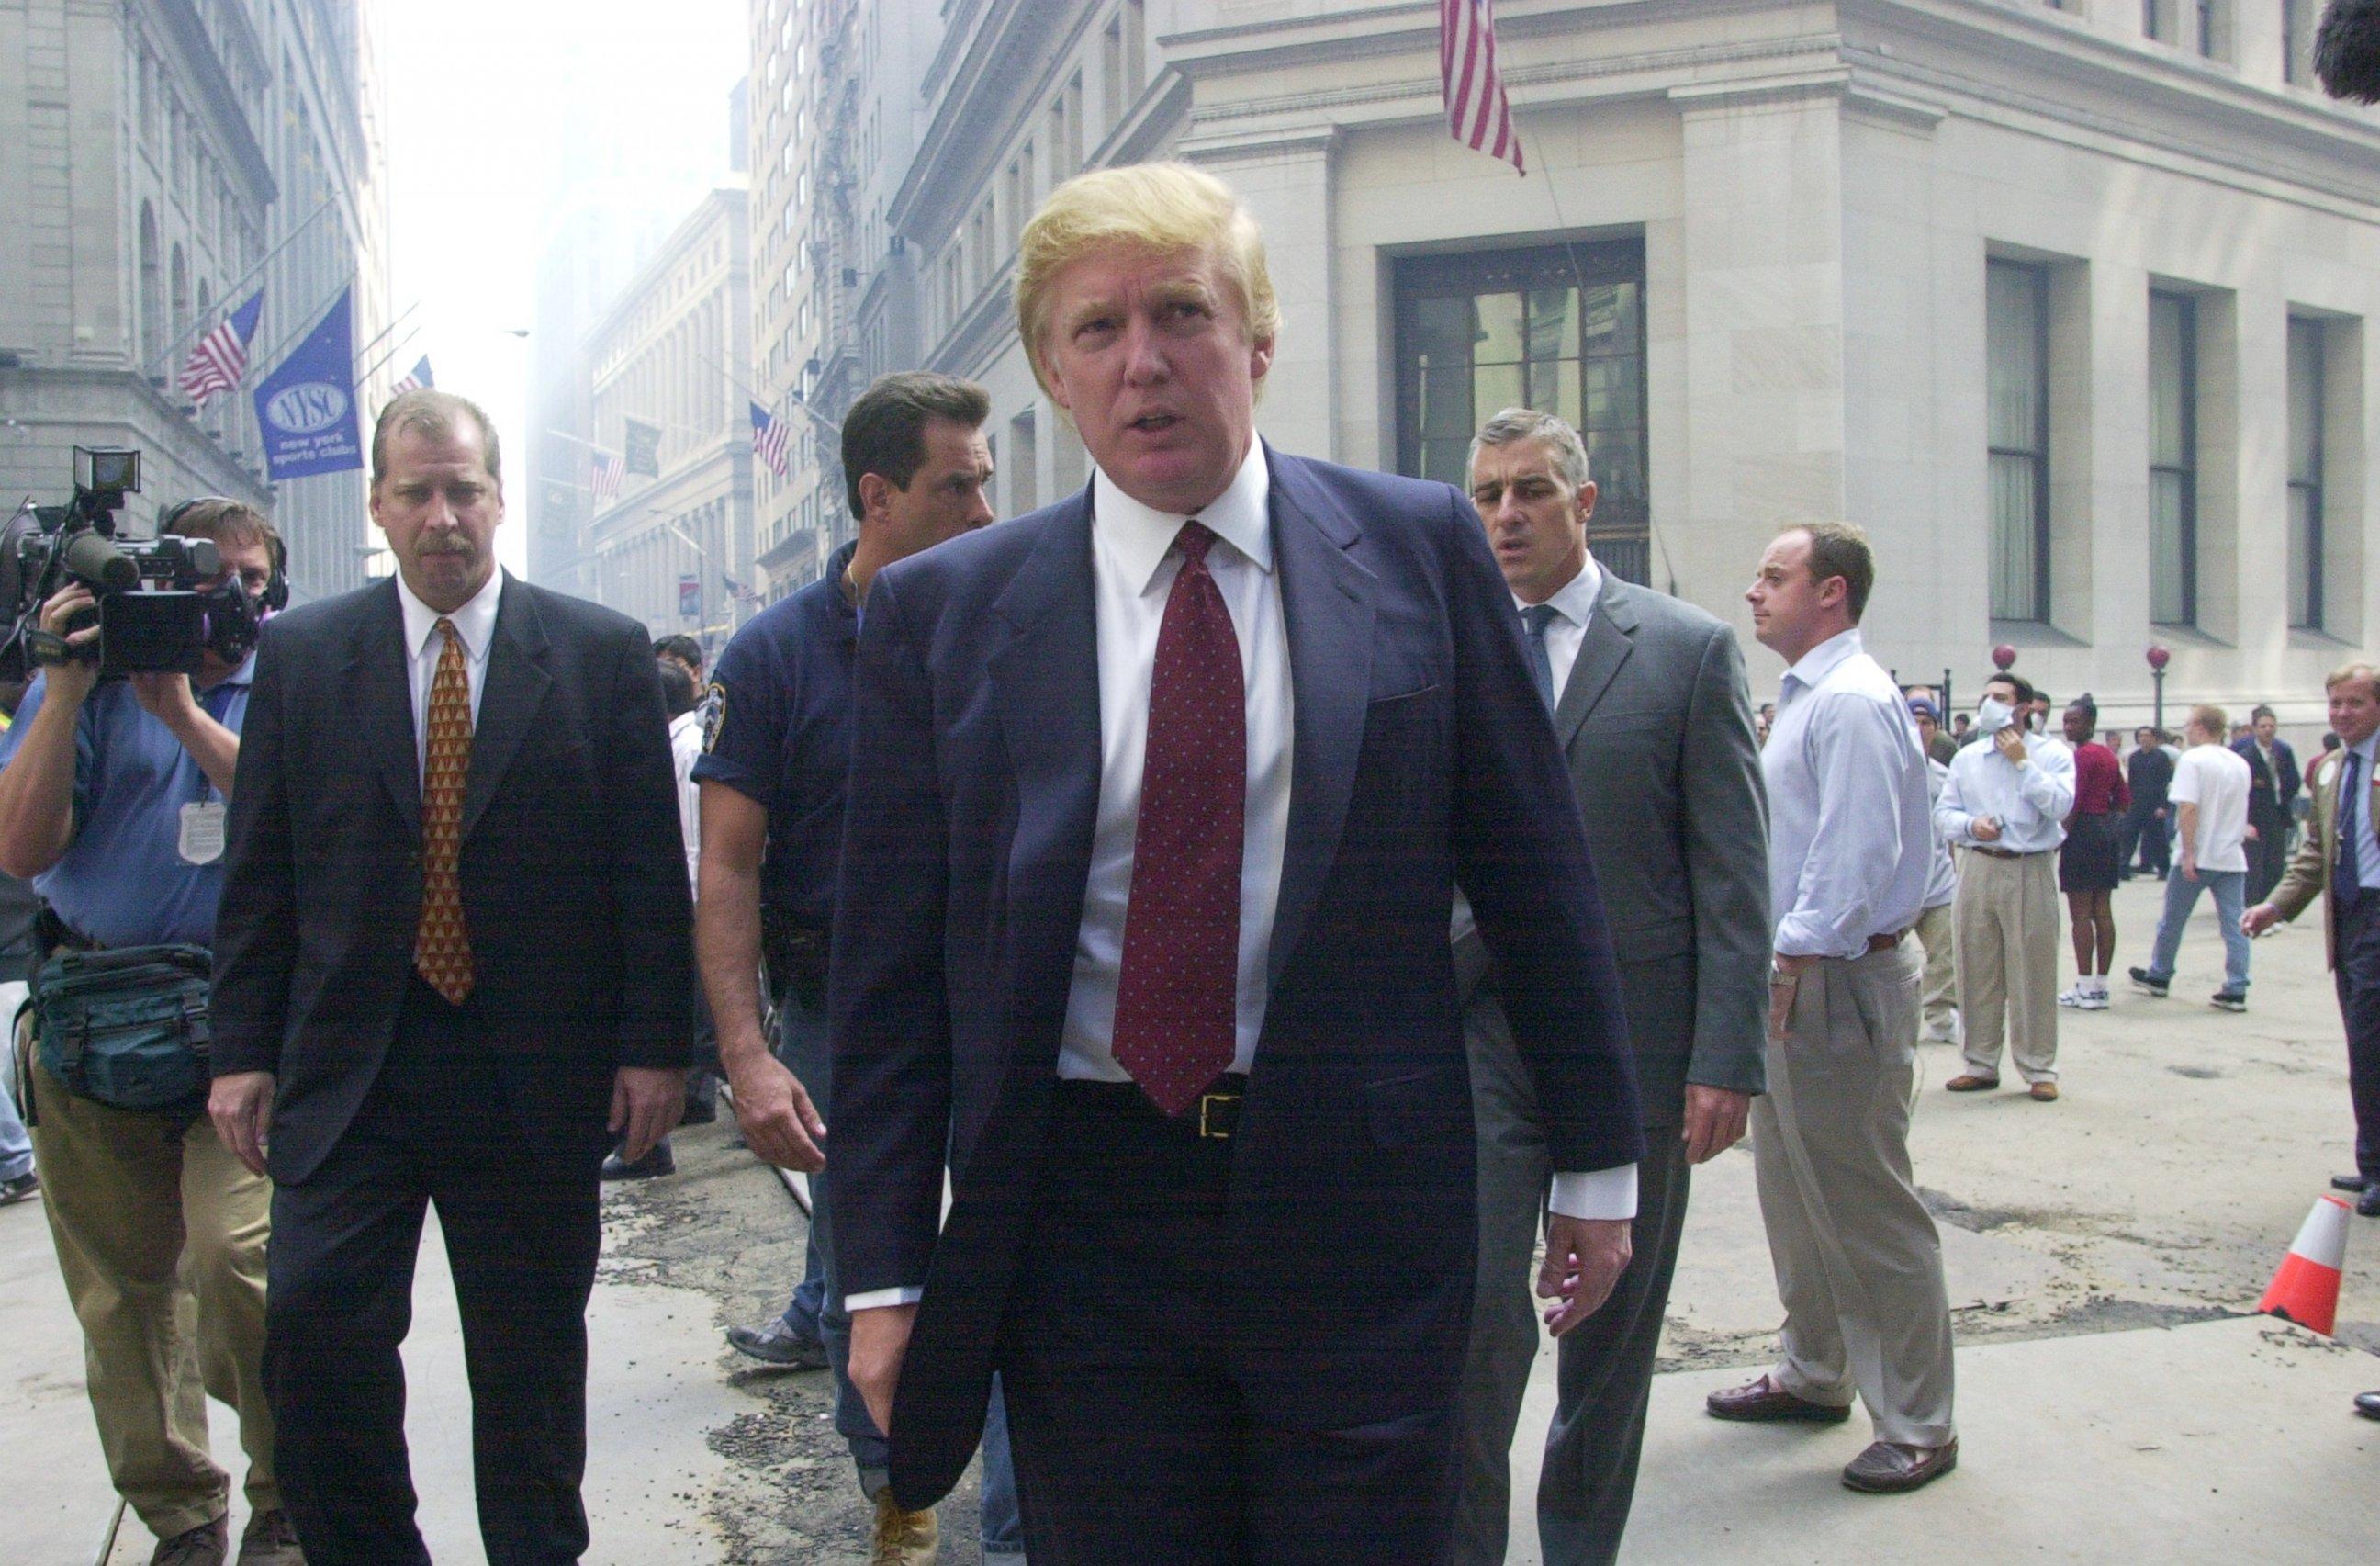 Photo Donald Trump Speaks Outside The New York Stock